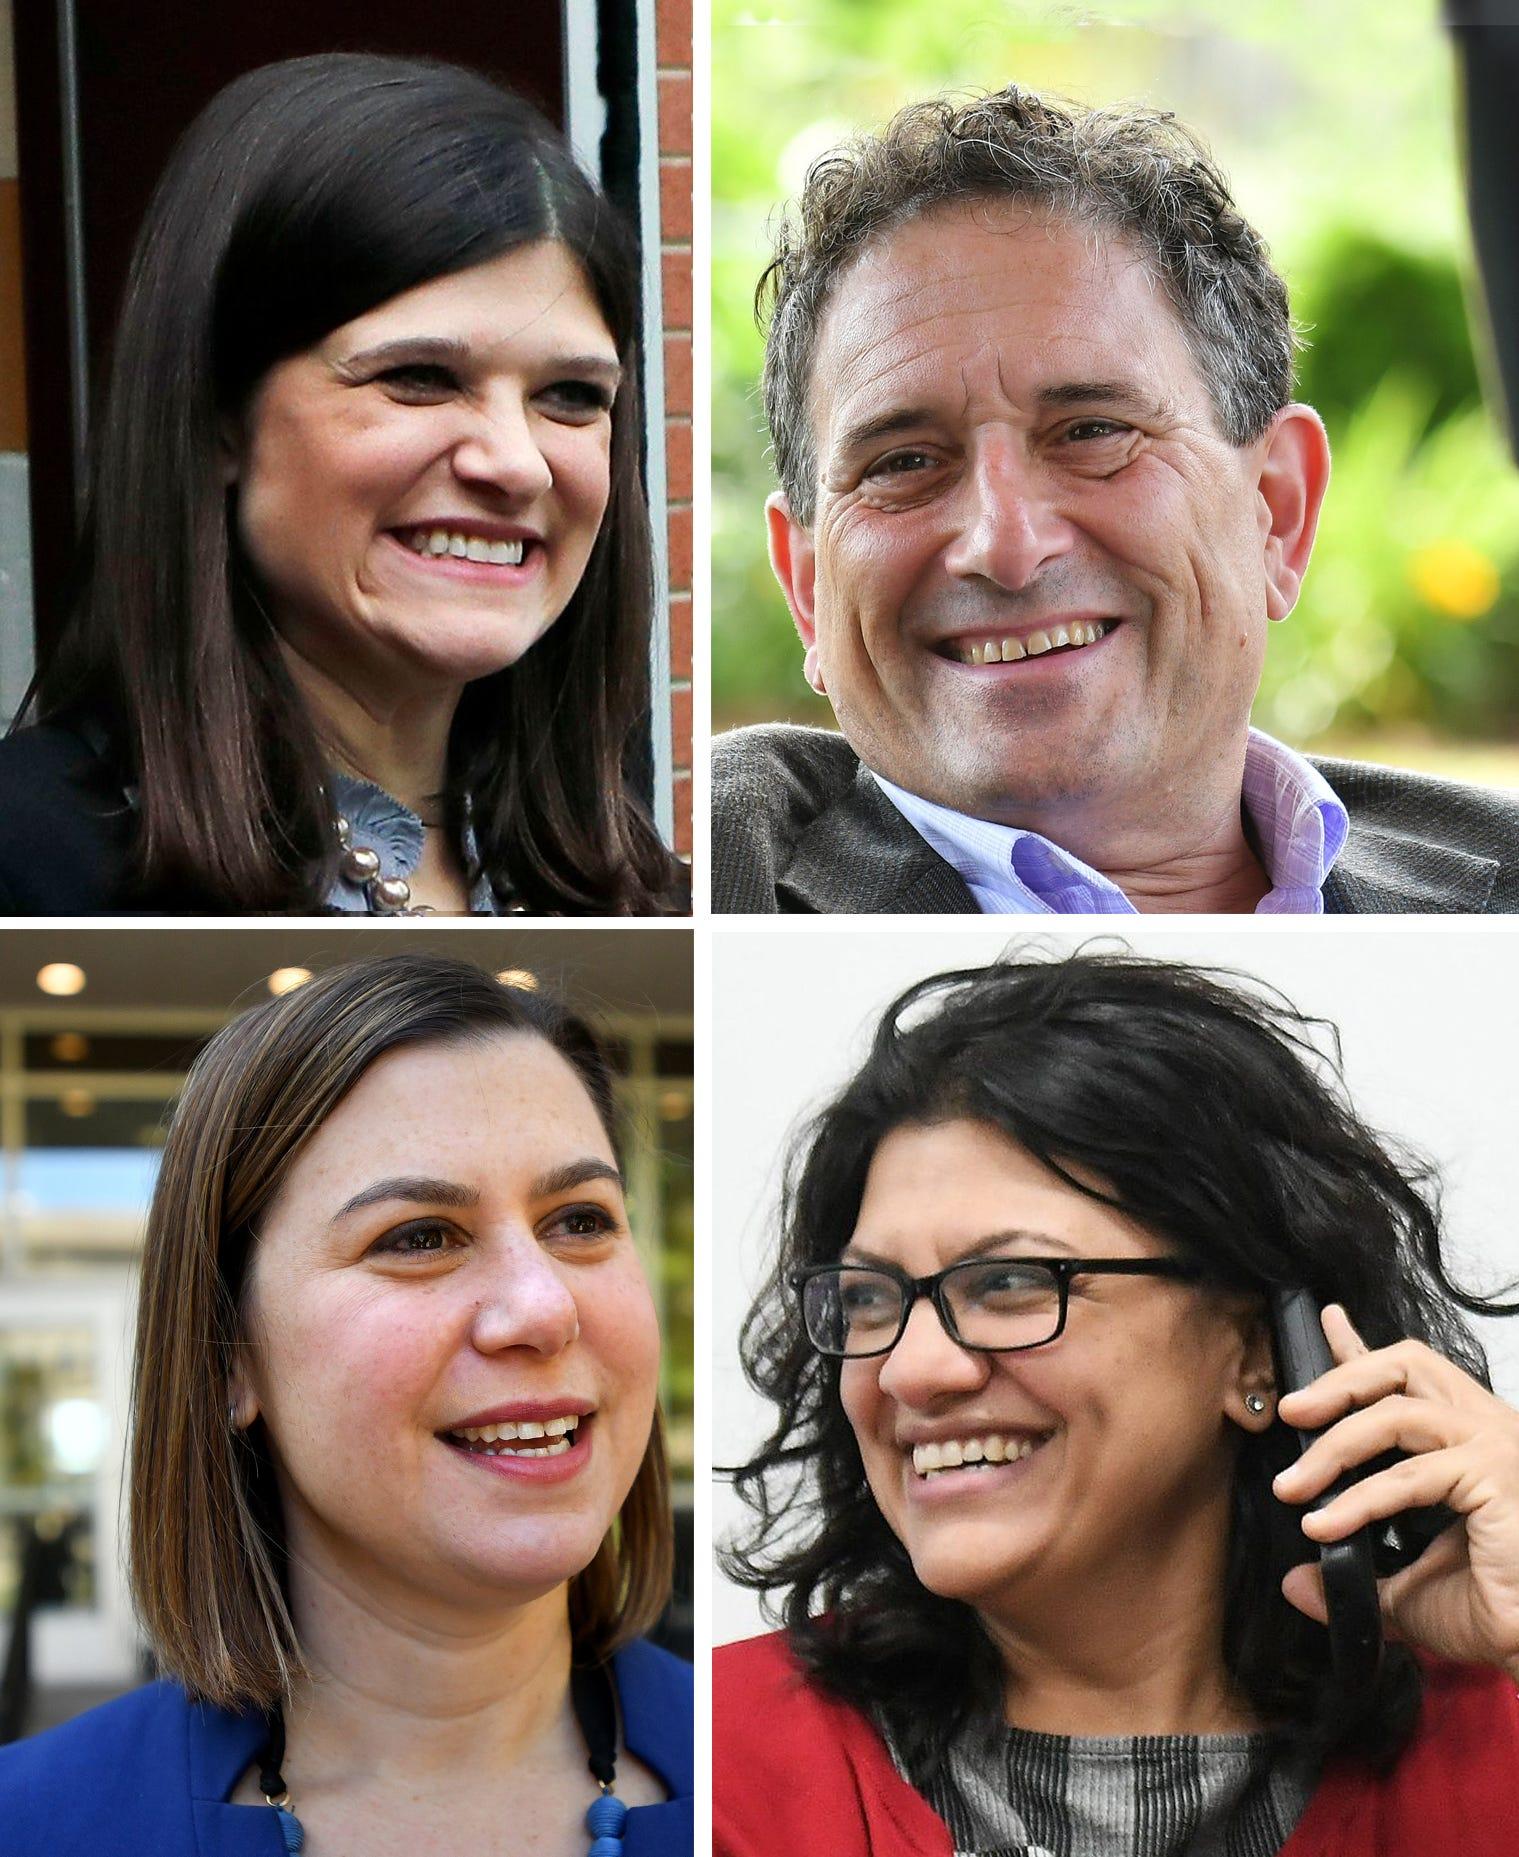 Michigan's new Congress members, clockwise from upper left: Haley Stevens, Andy Levin, Rashida Tlaib, Elissa Slotkin